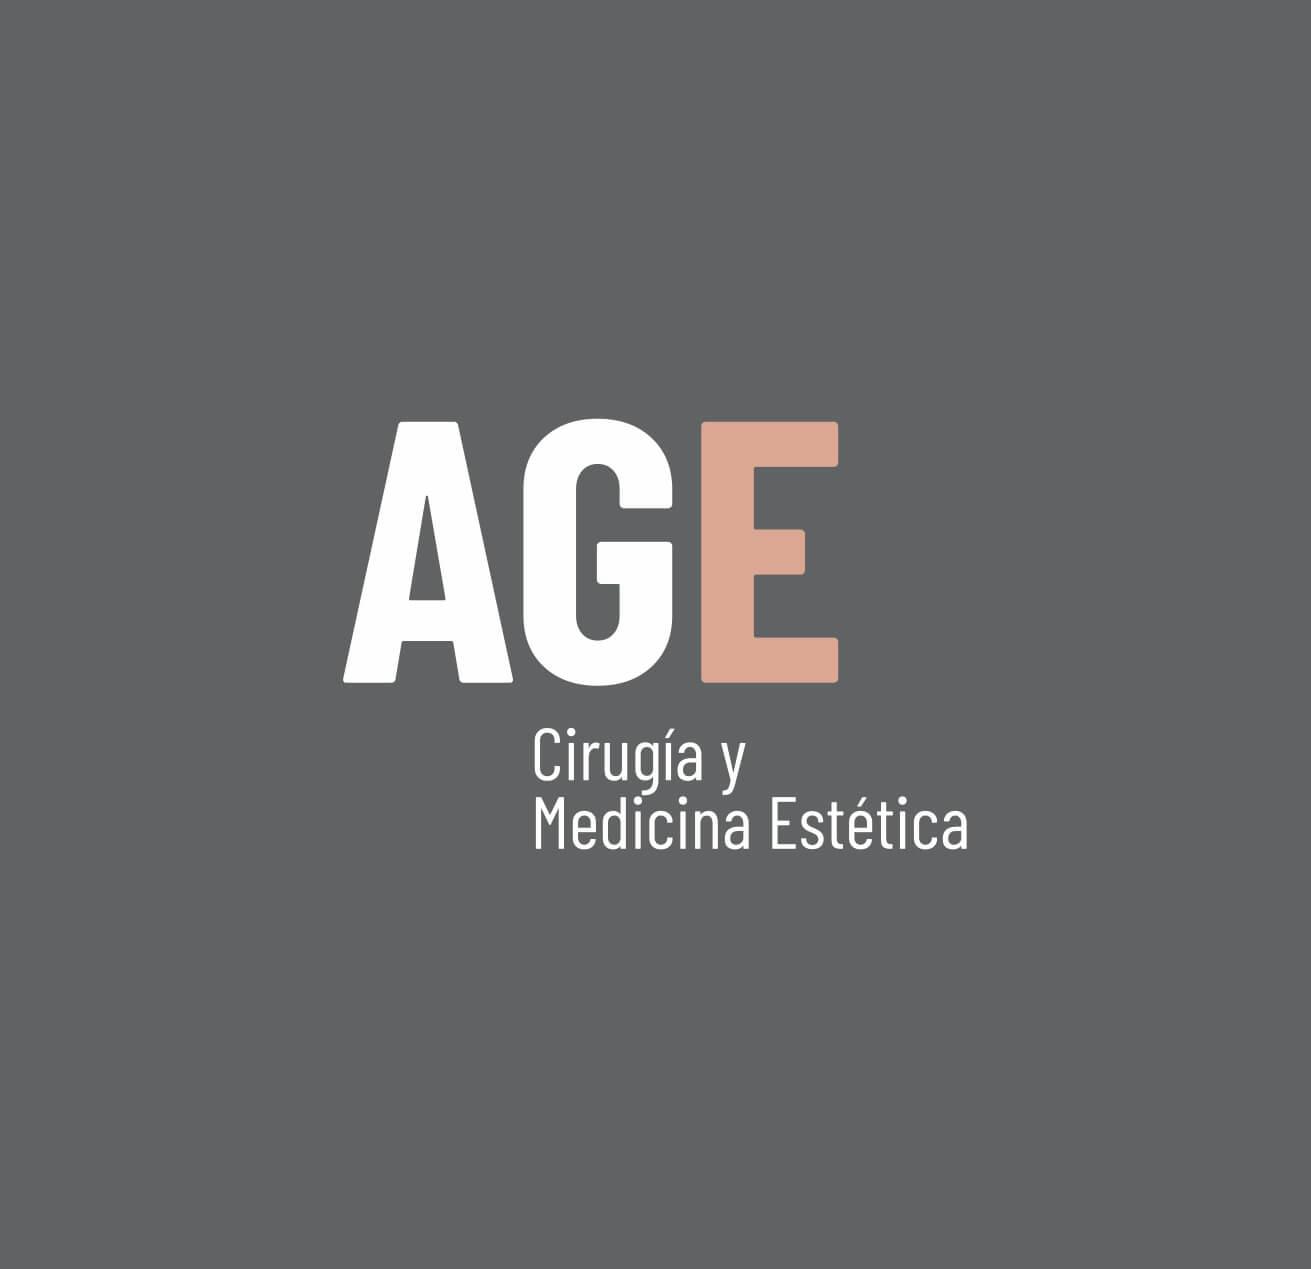 Imagen logo AGE